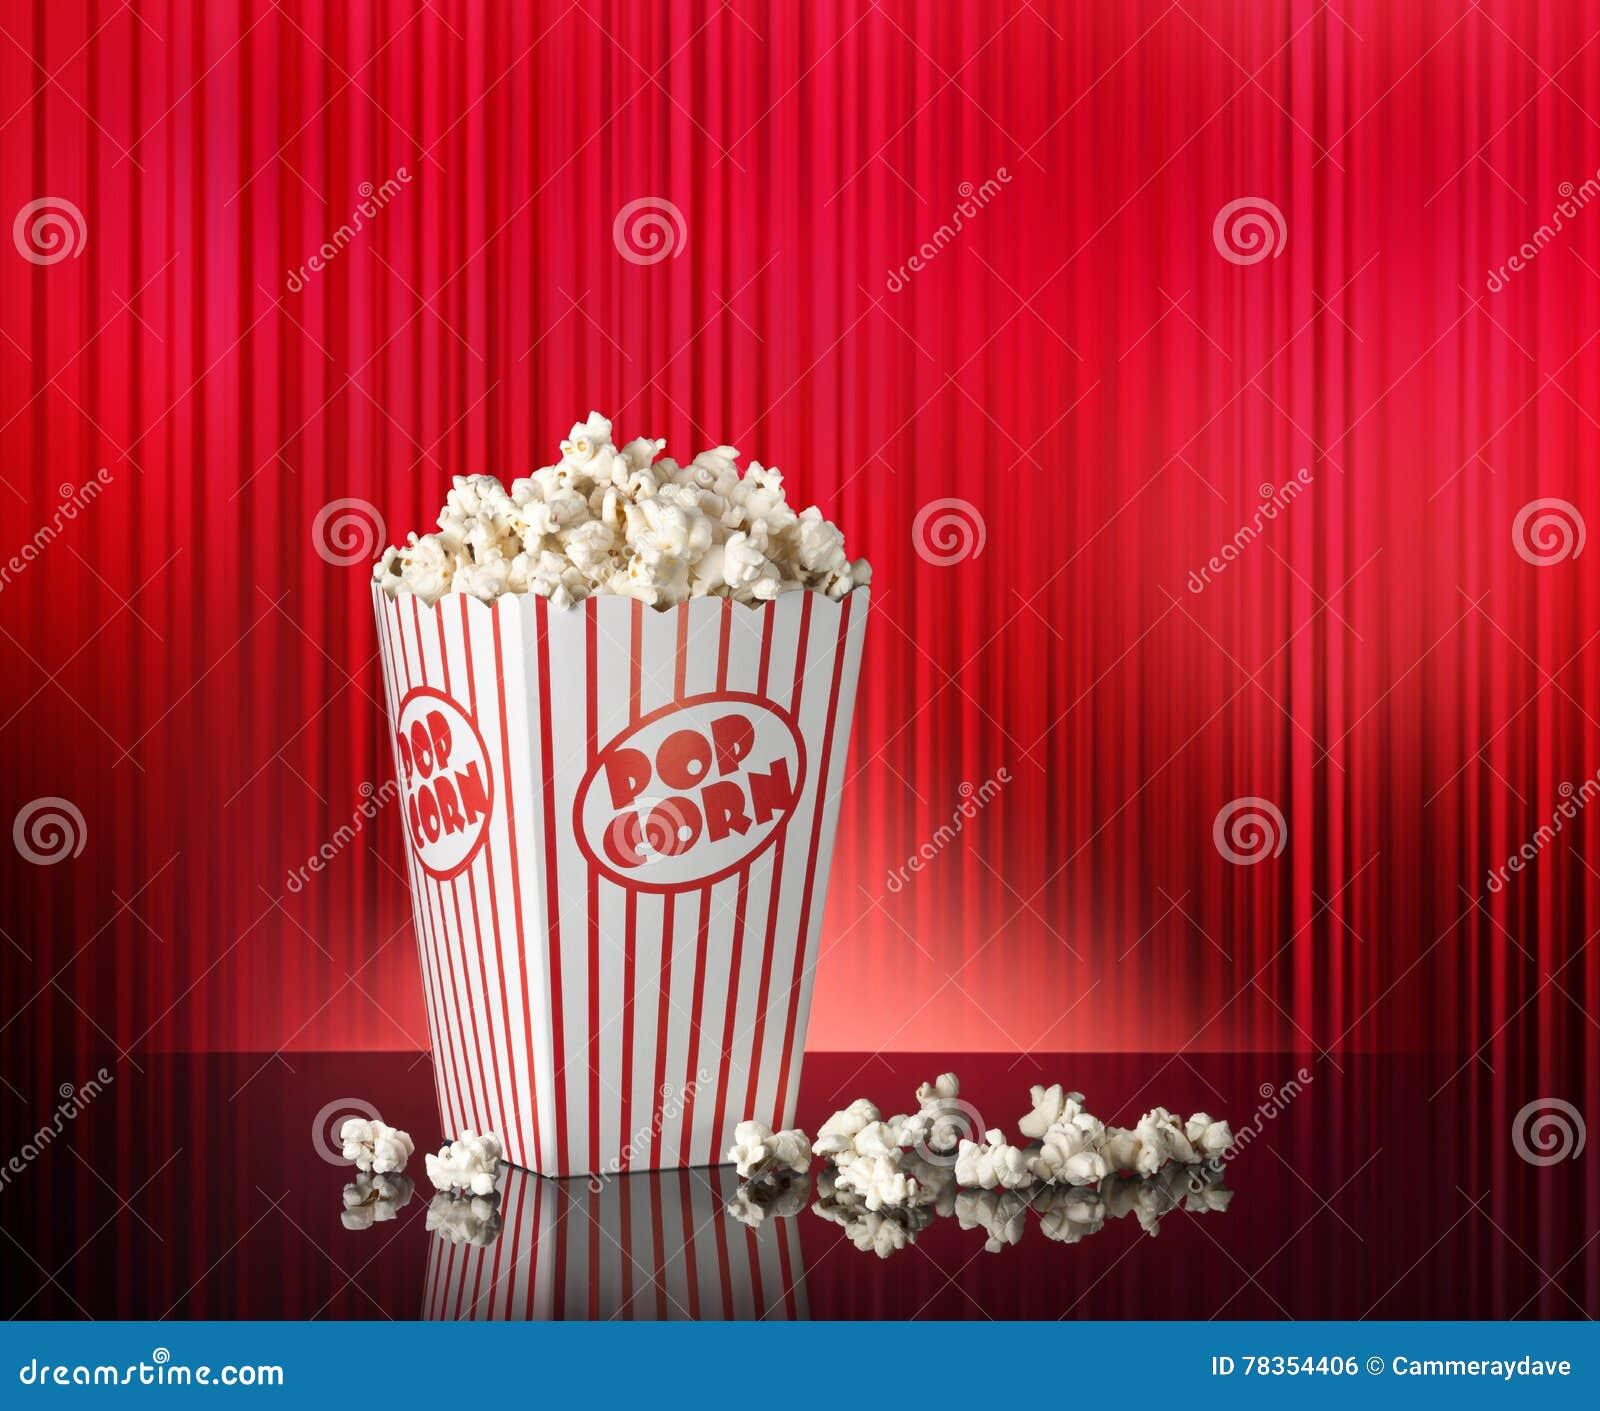 Popcorn Wallpaper: Popcorn Red Movie Theater Background Stock Photo